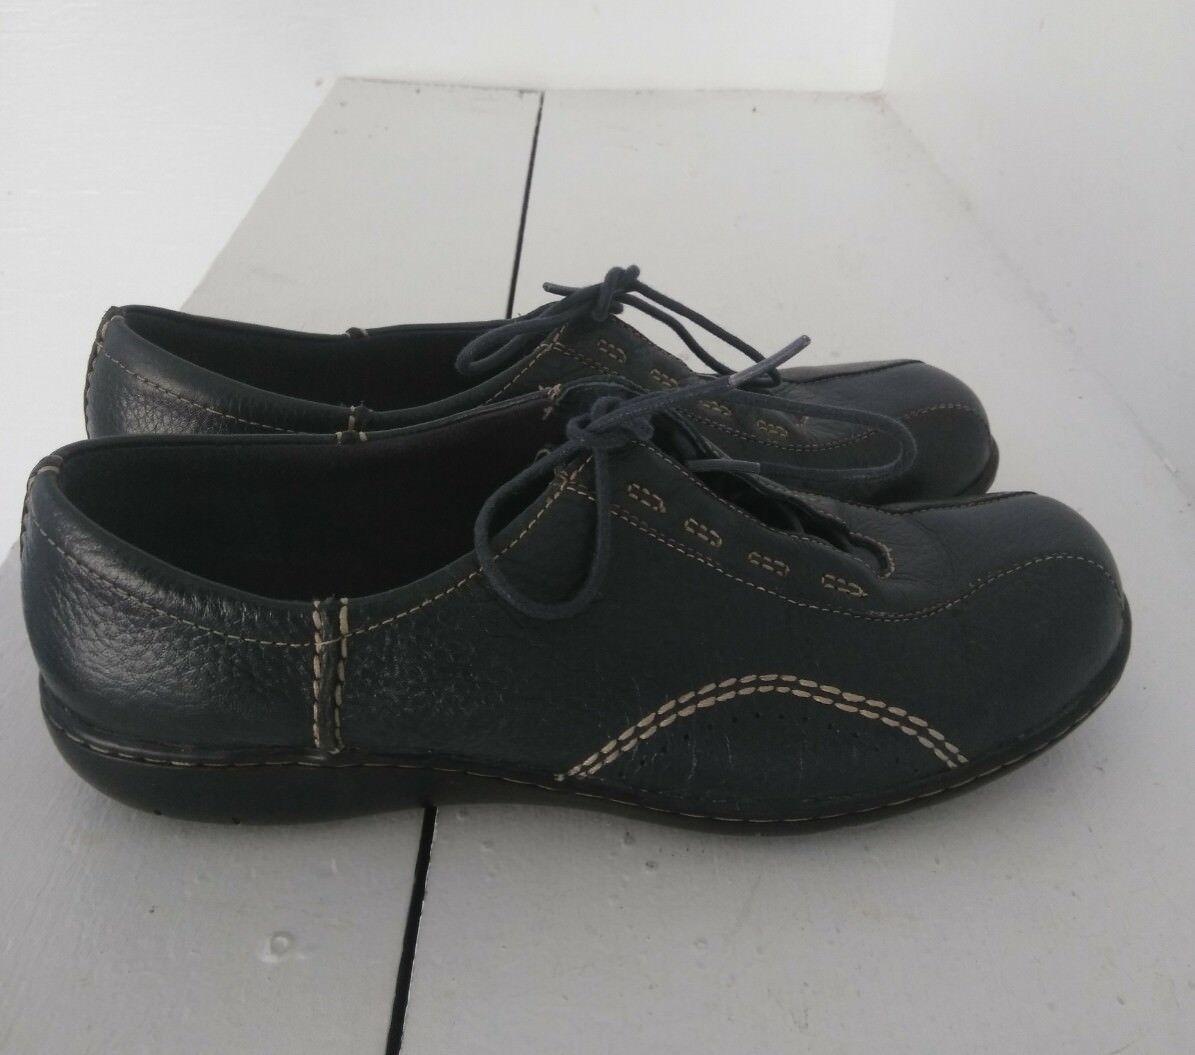 Clarks Everlay Tara Round Toe Leather Flats Slip On shoes, Navy, Sz 10M